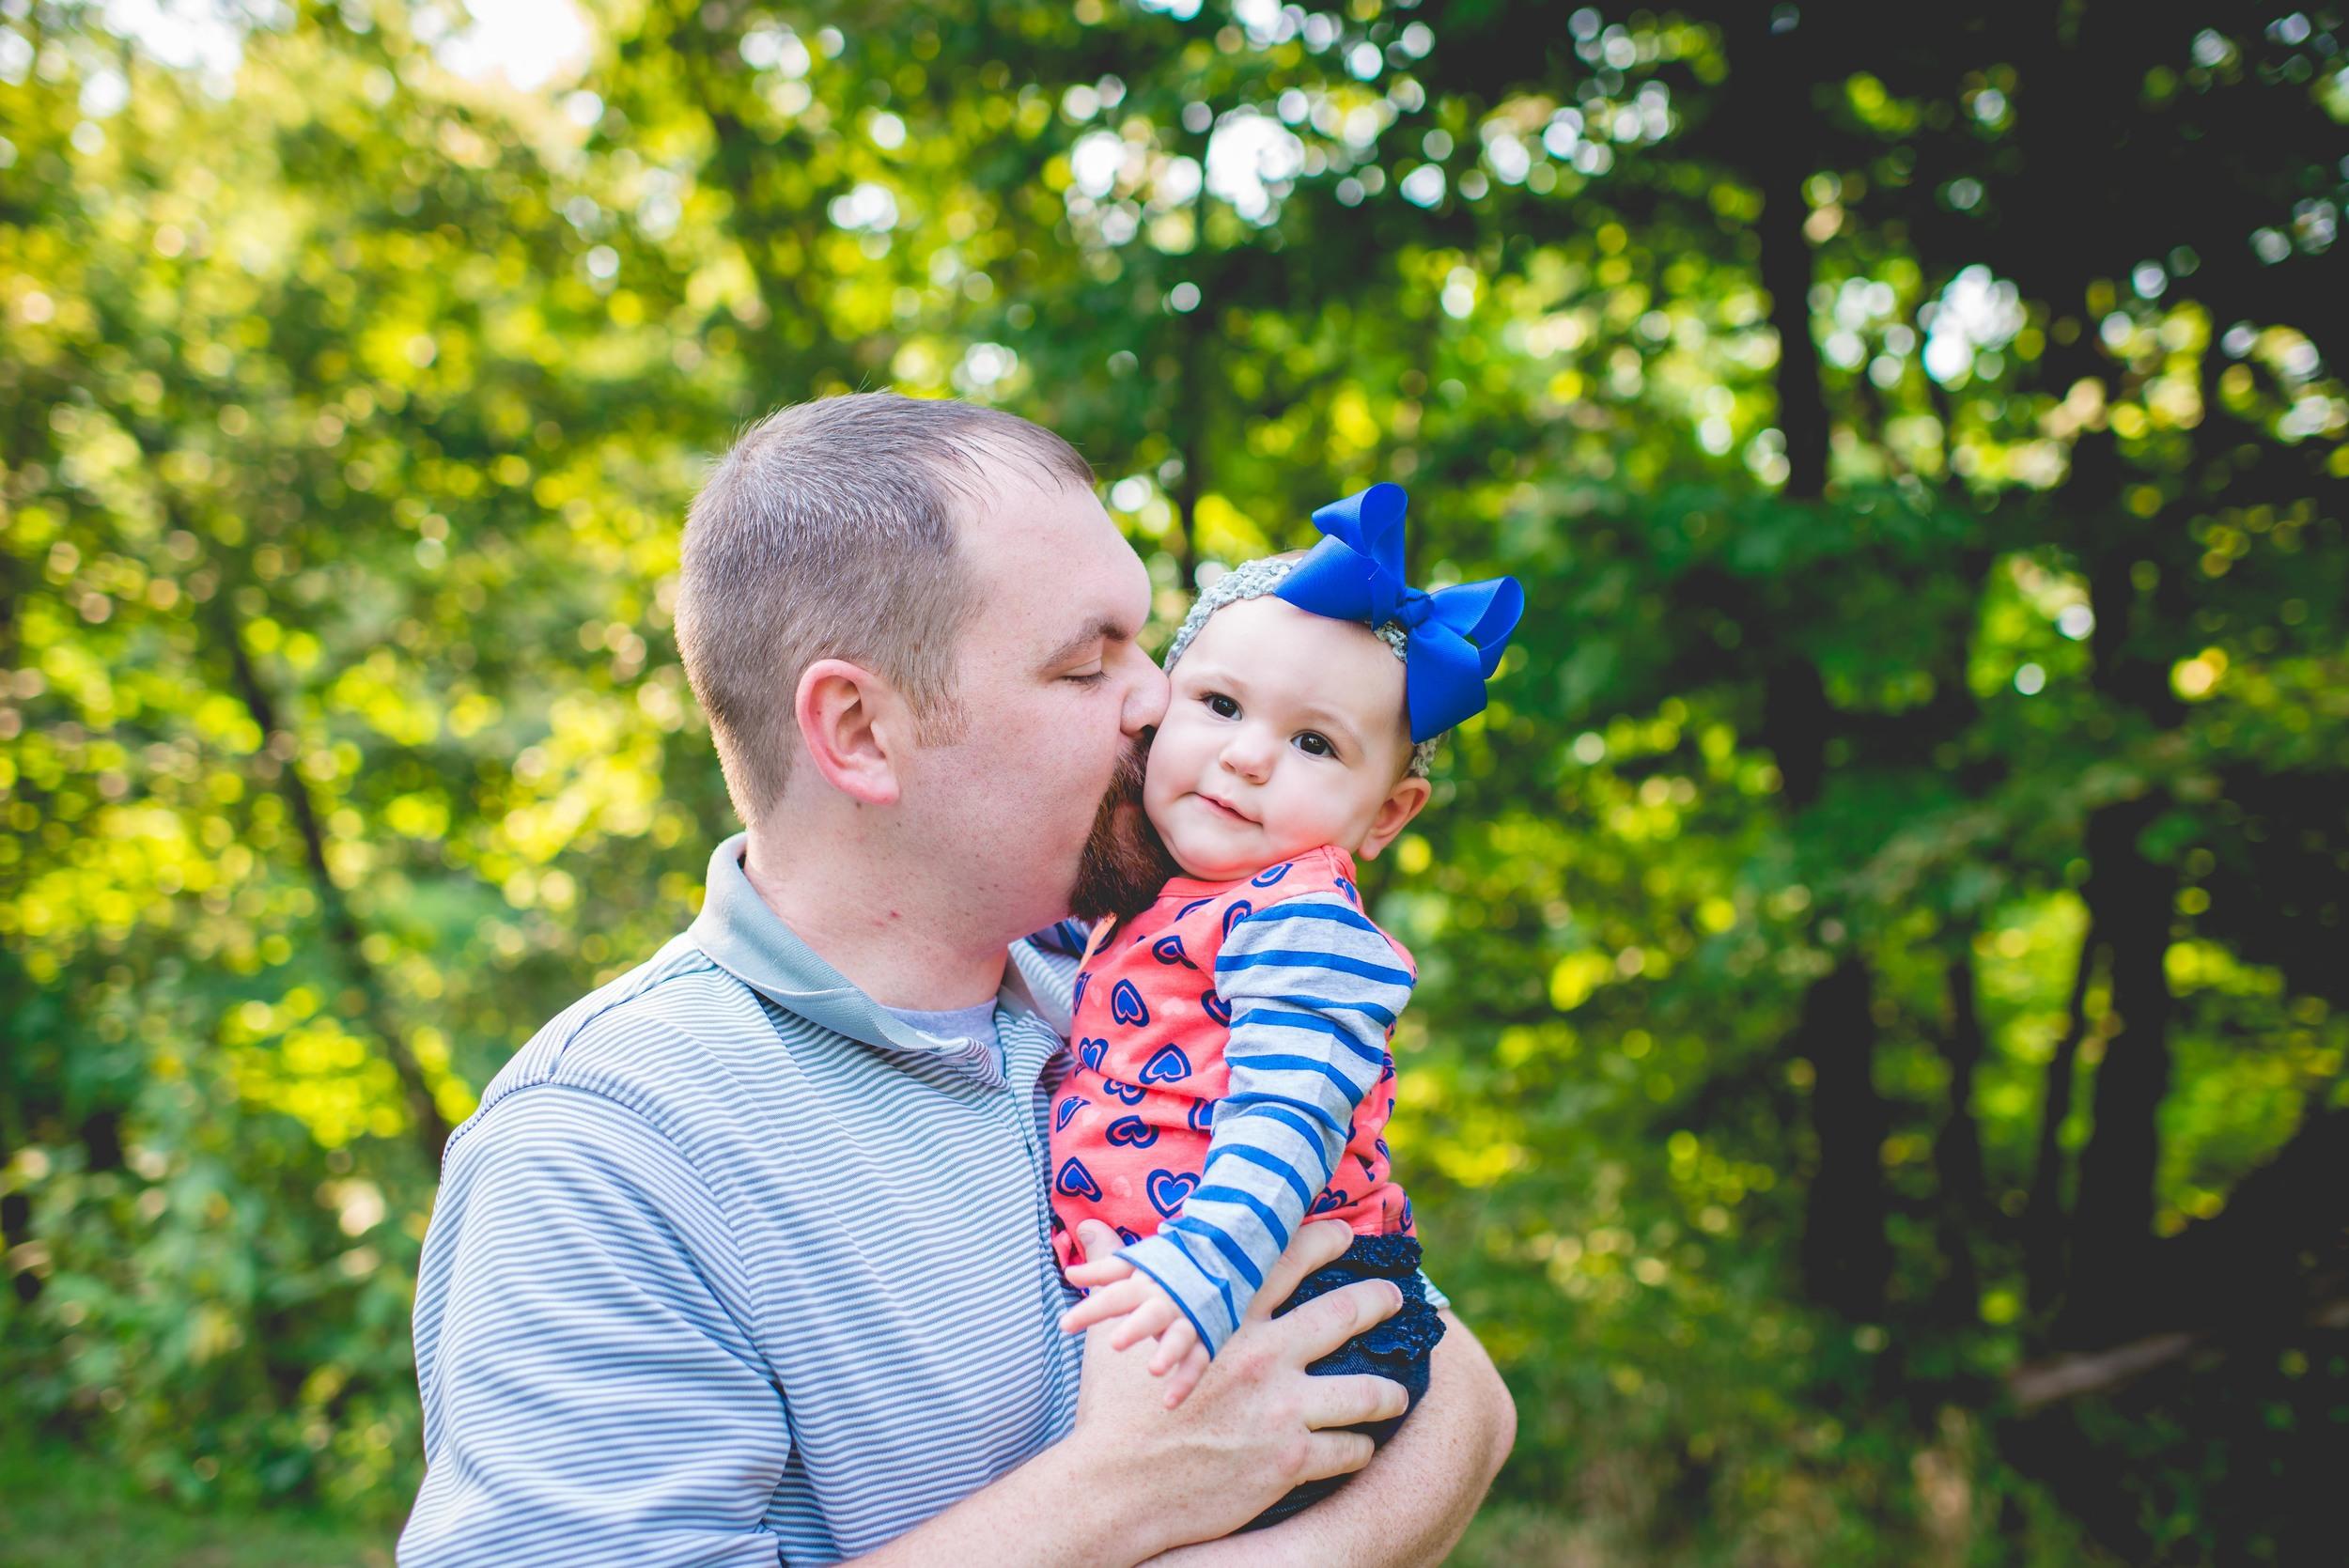 sarasutterphotography_family_Johnson_2015-84.jpg